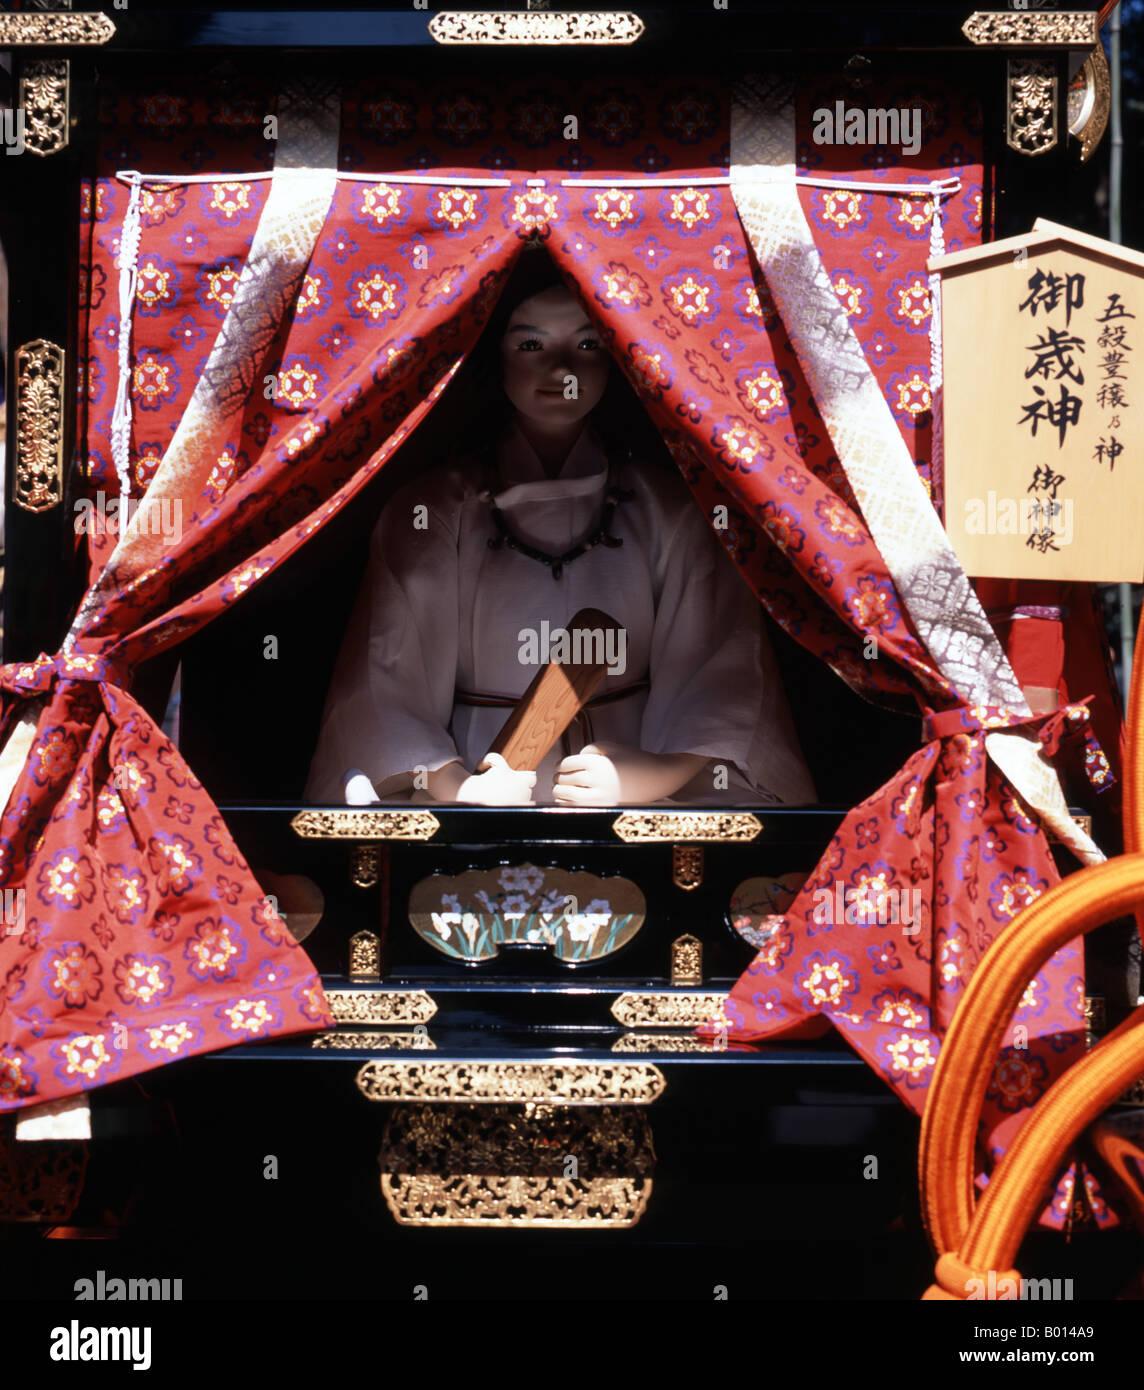 Princess doll inside mikoshi ( portable shrine ) at Honensai Festival, Tagata Shrine, Nagoya, Japan - Stock Image